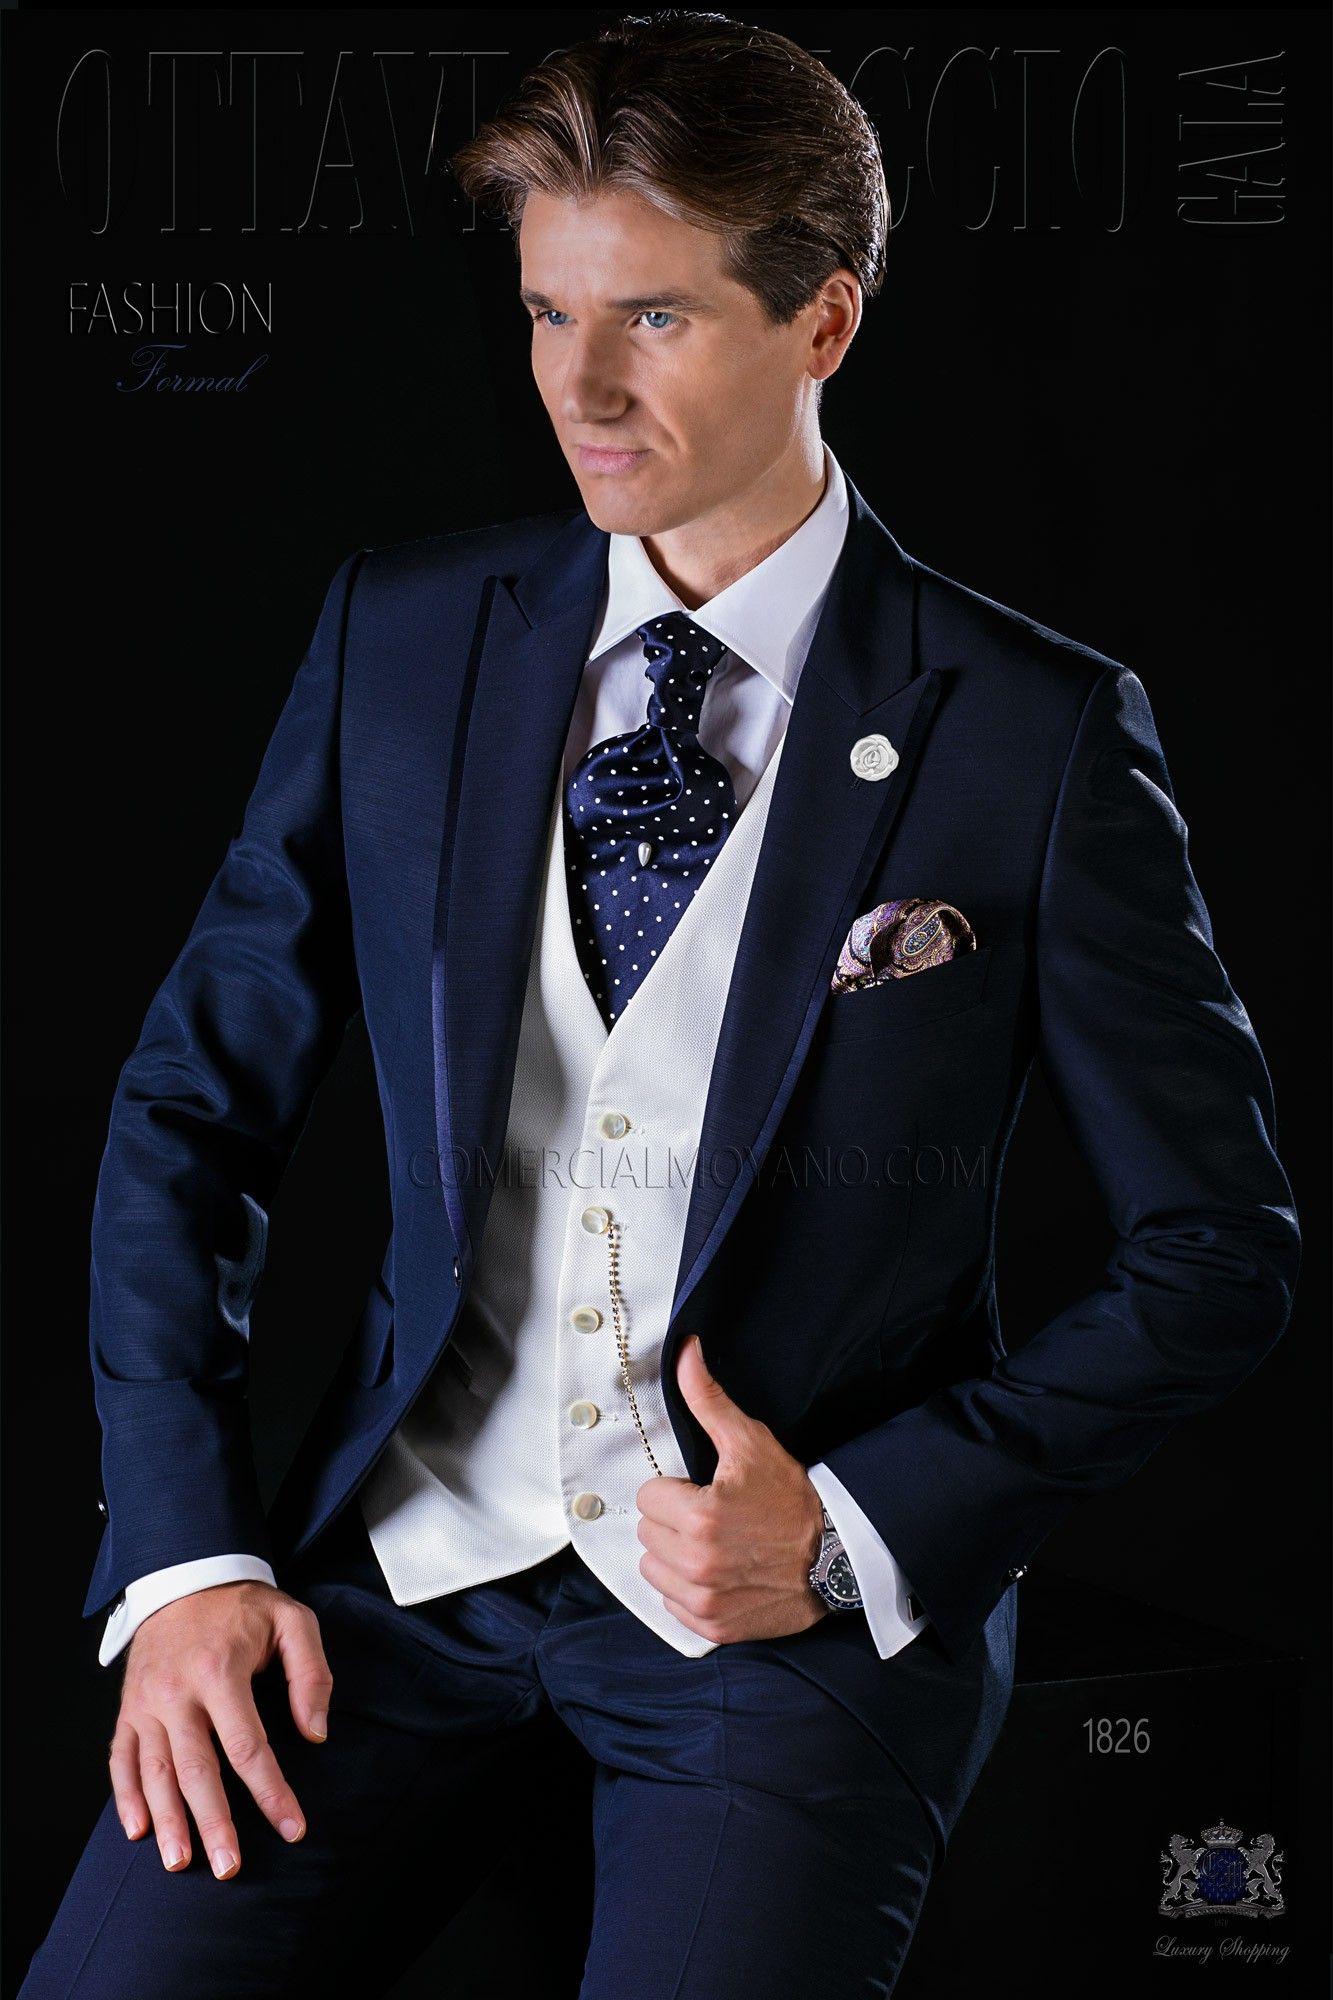 Blaue Bräutigam Anzug aus Wollmischung | Bräutigam anzüge ...